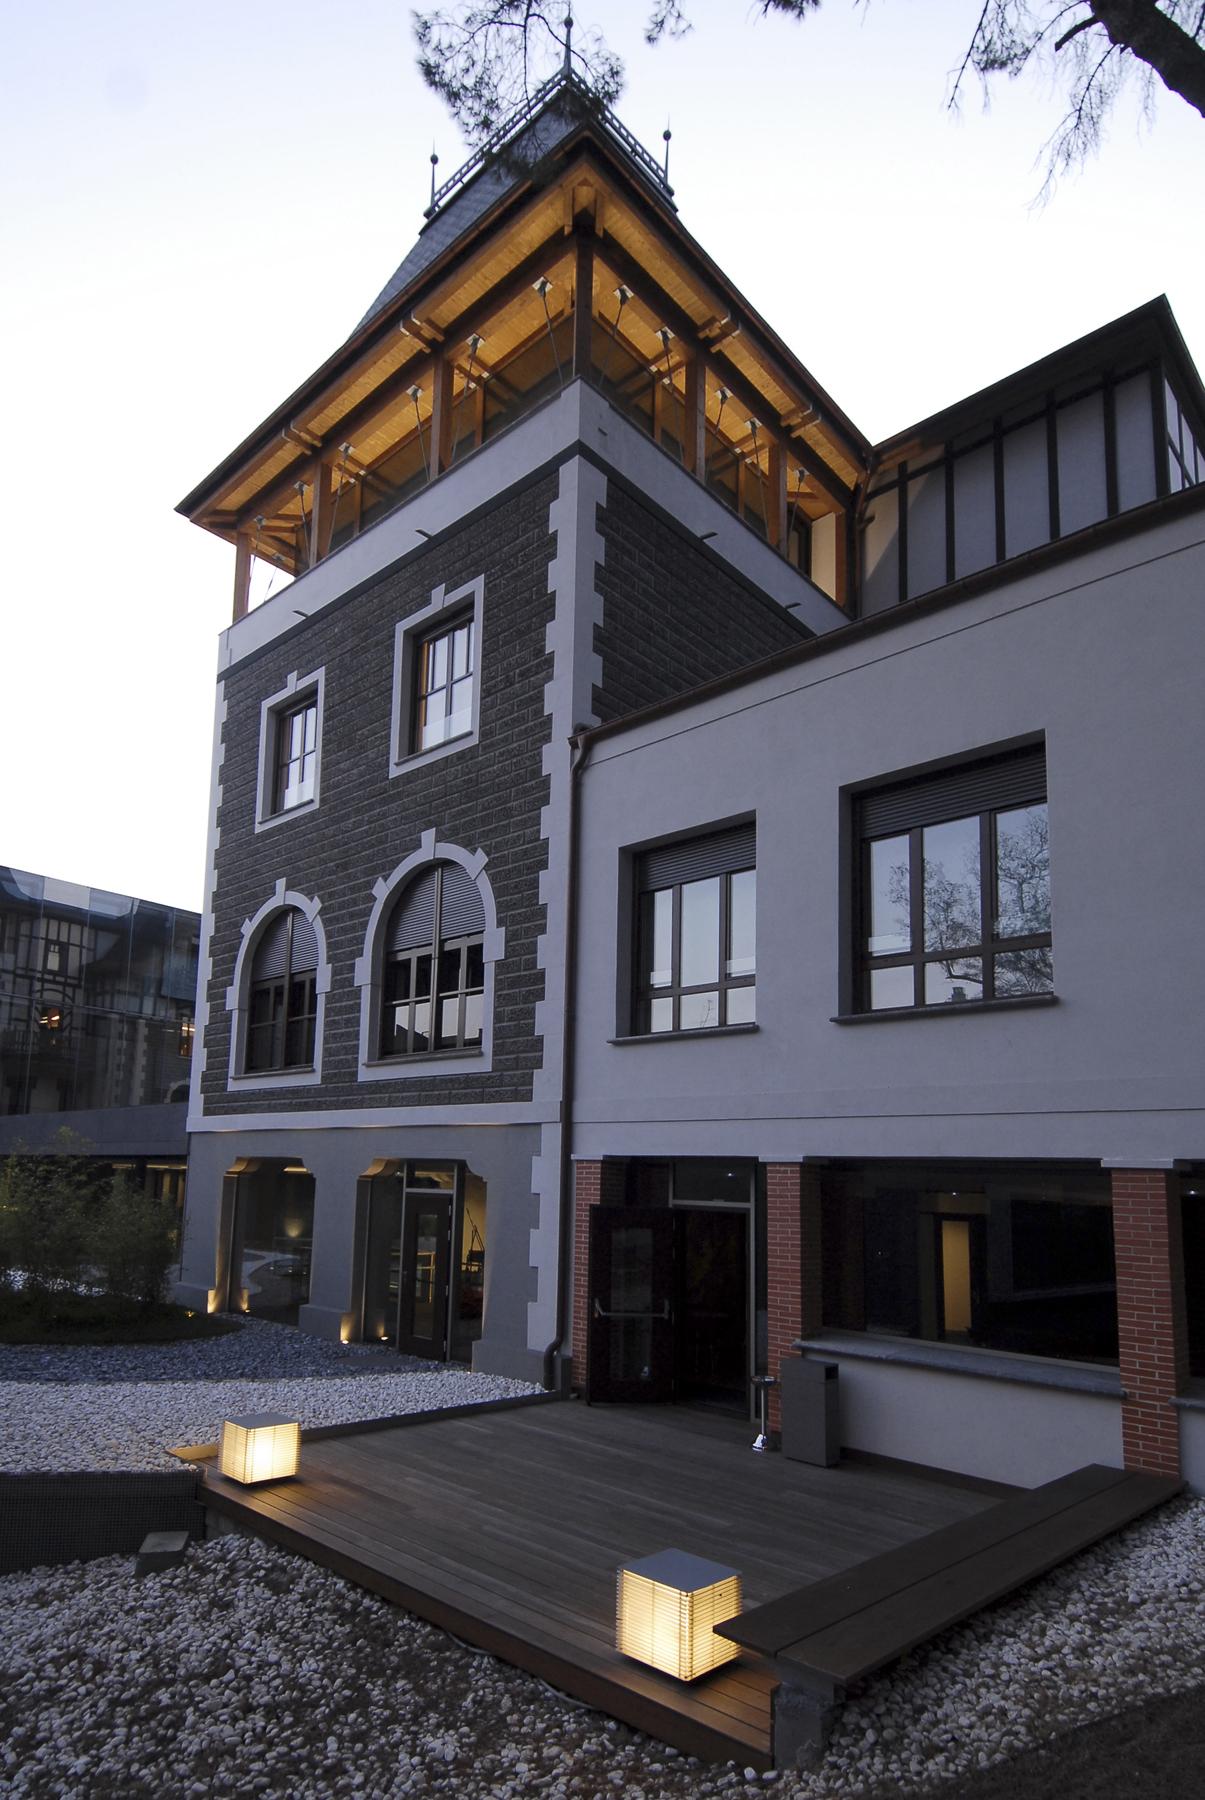 Biskaitik fotograf a arquitectura e interiores - Fotografia arquitectura ...